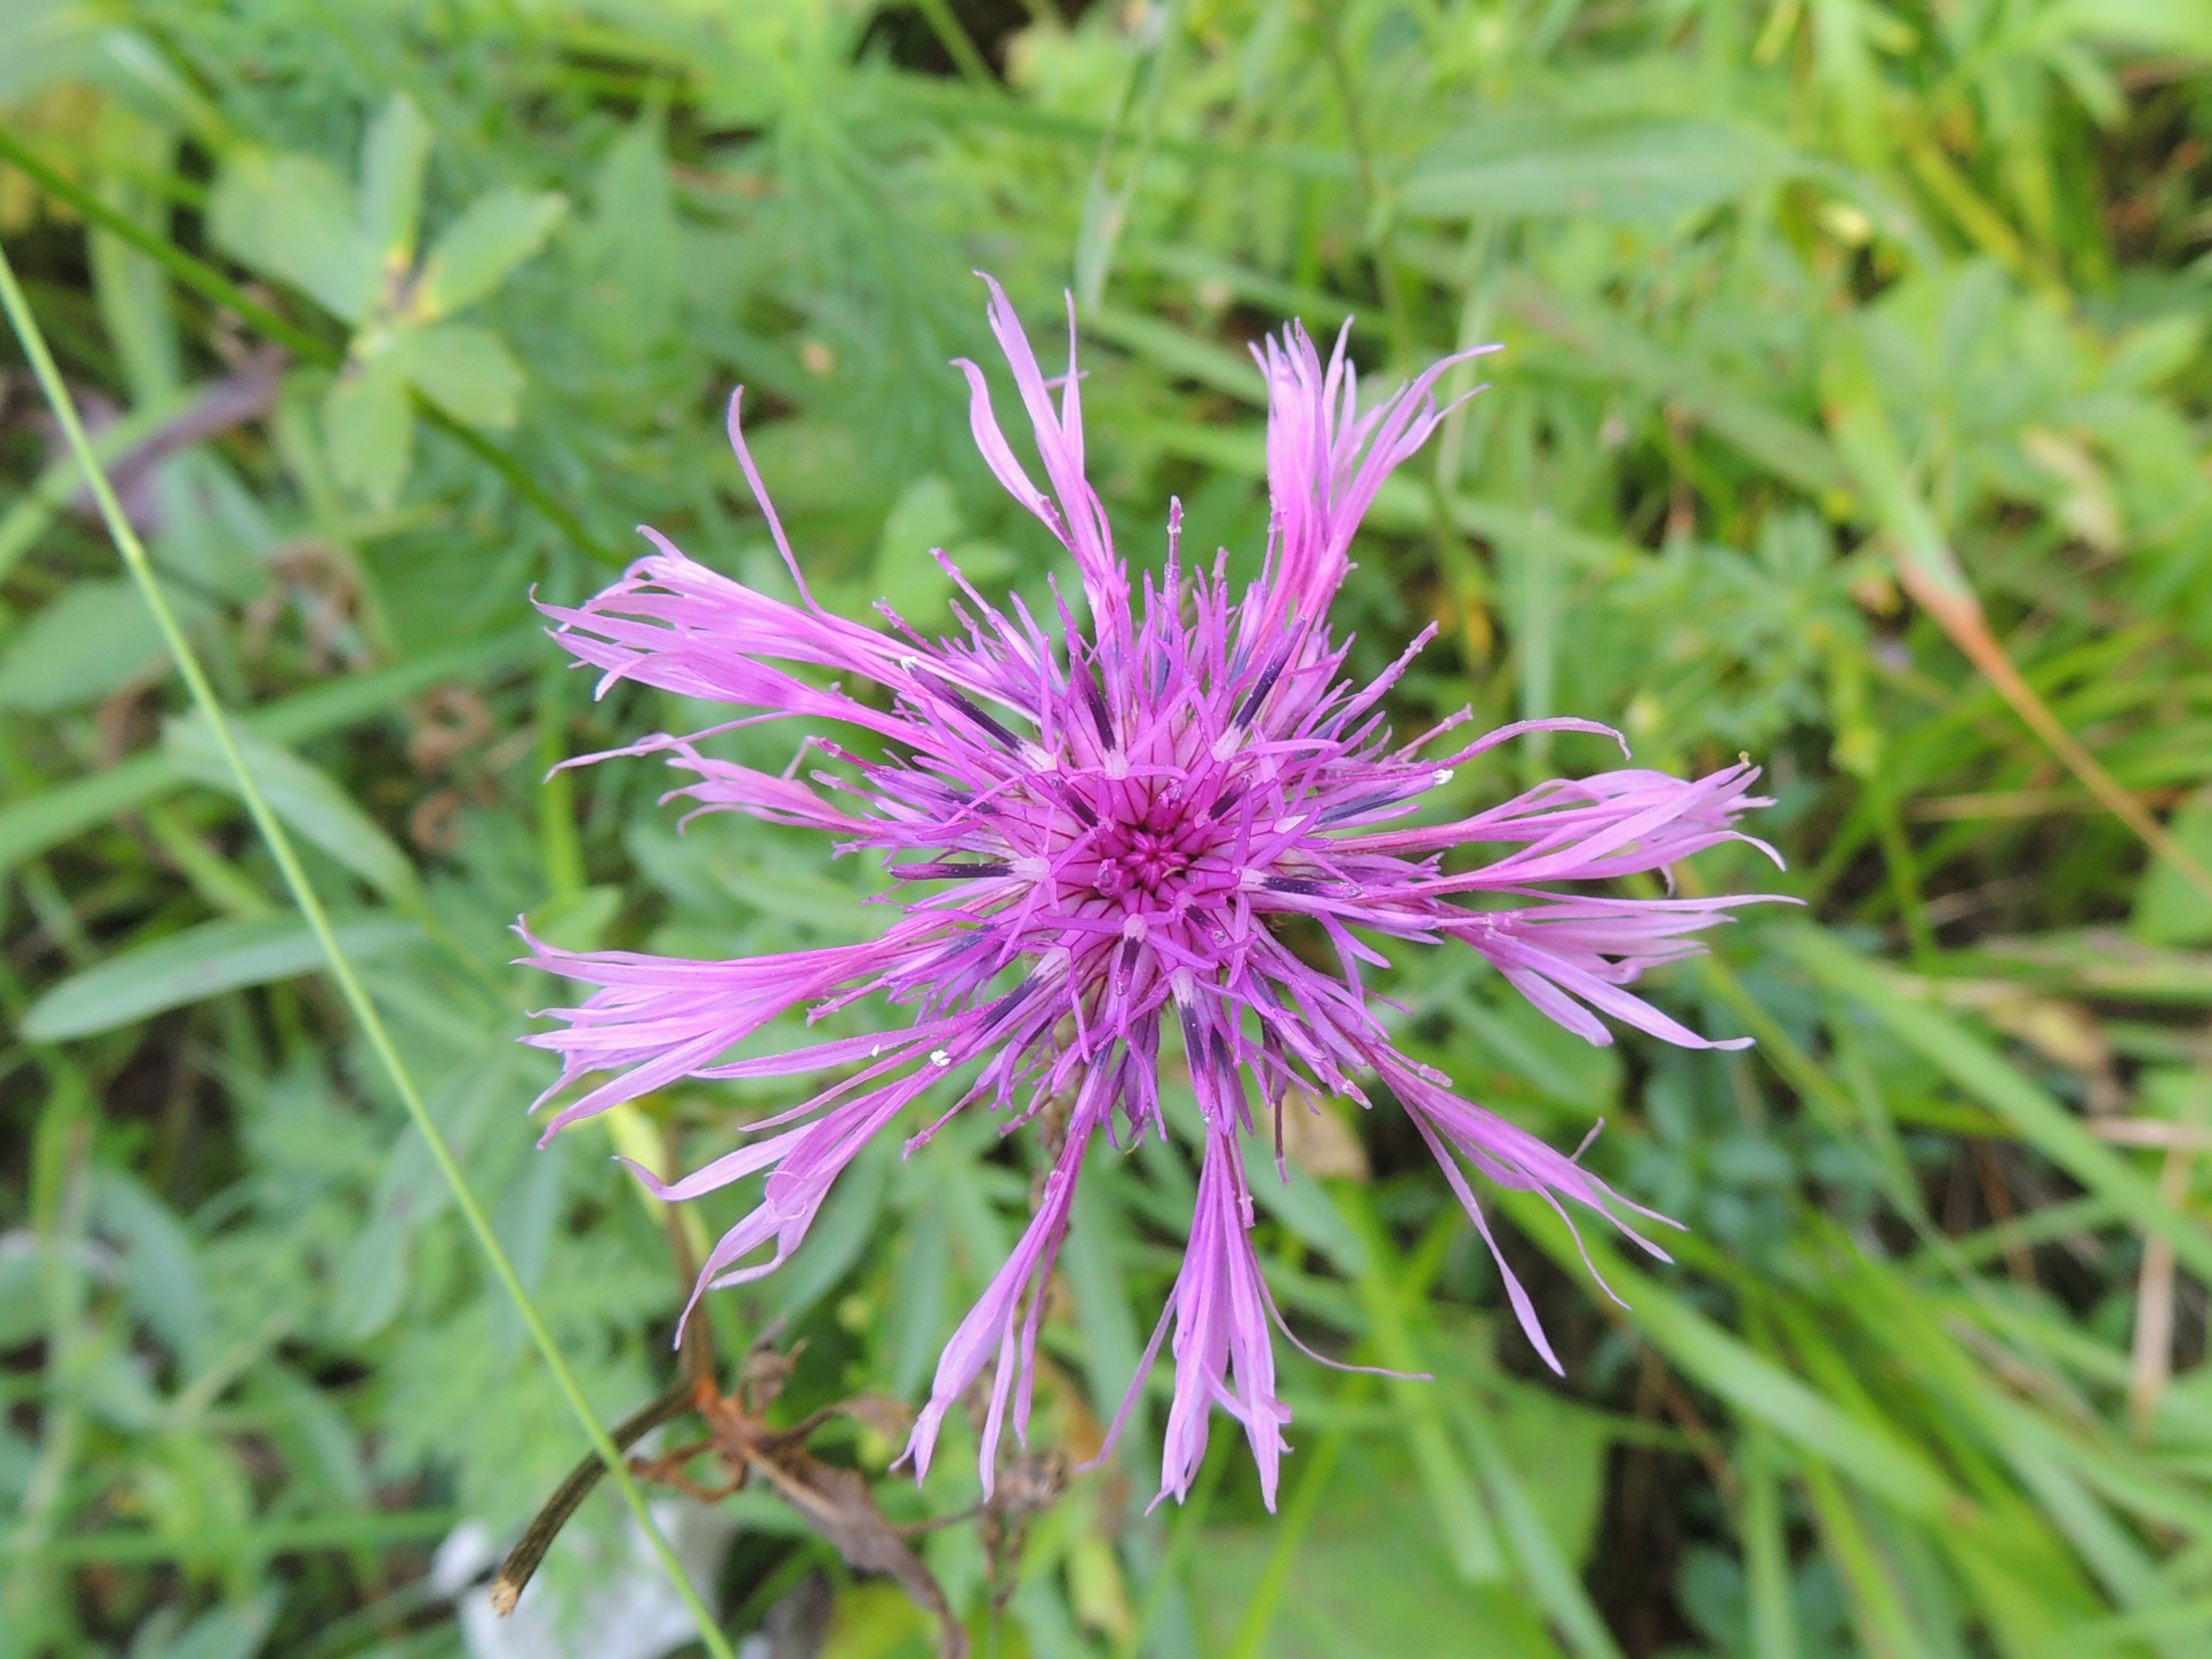 Flockenblume - Centaurea